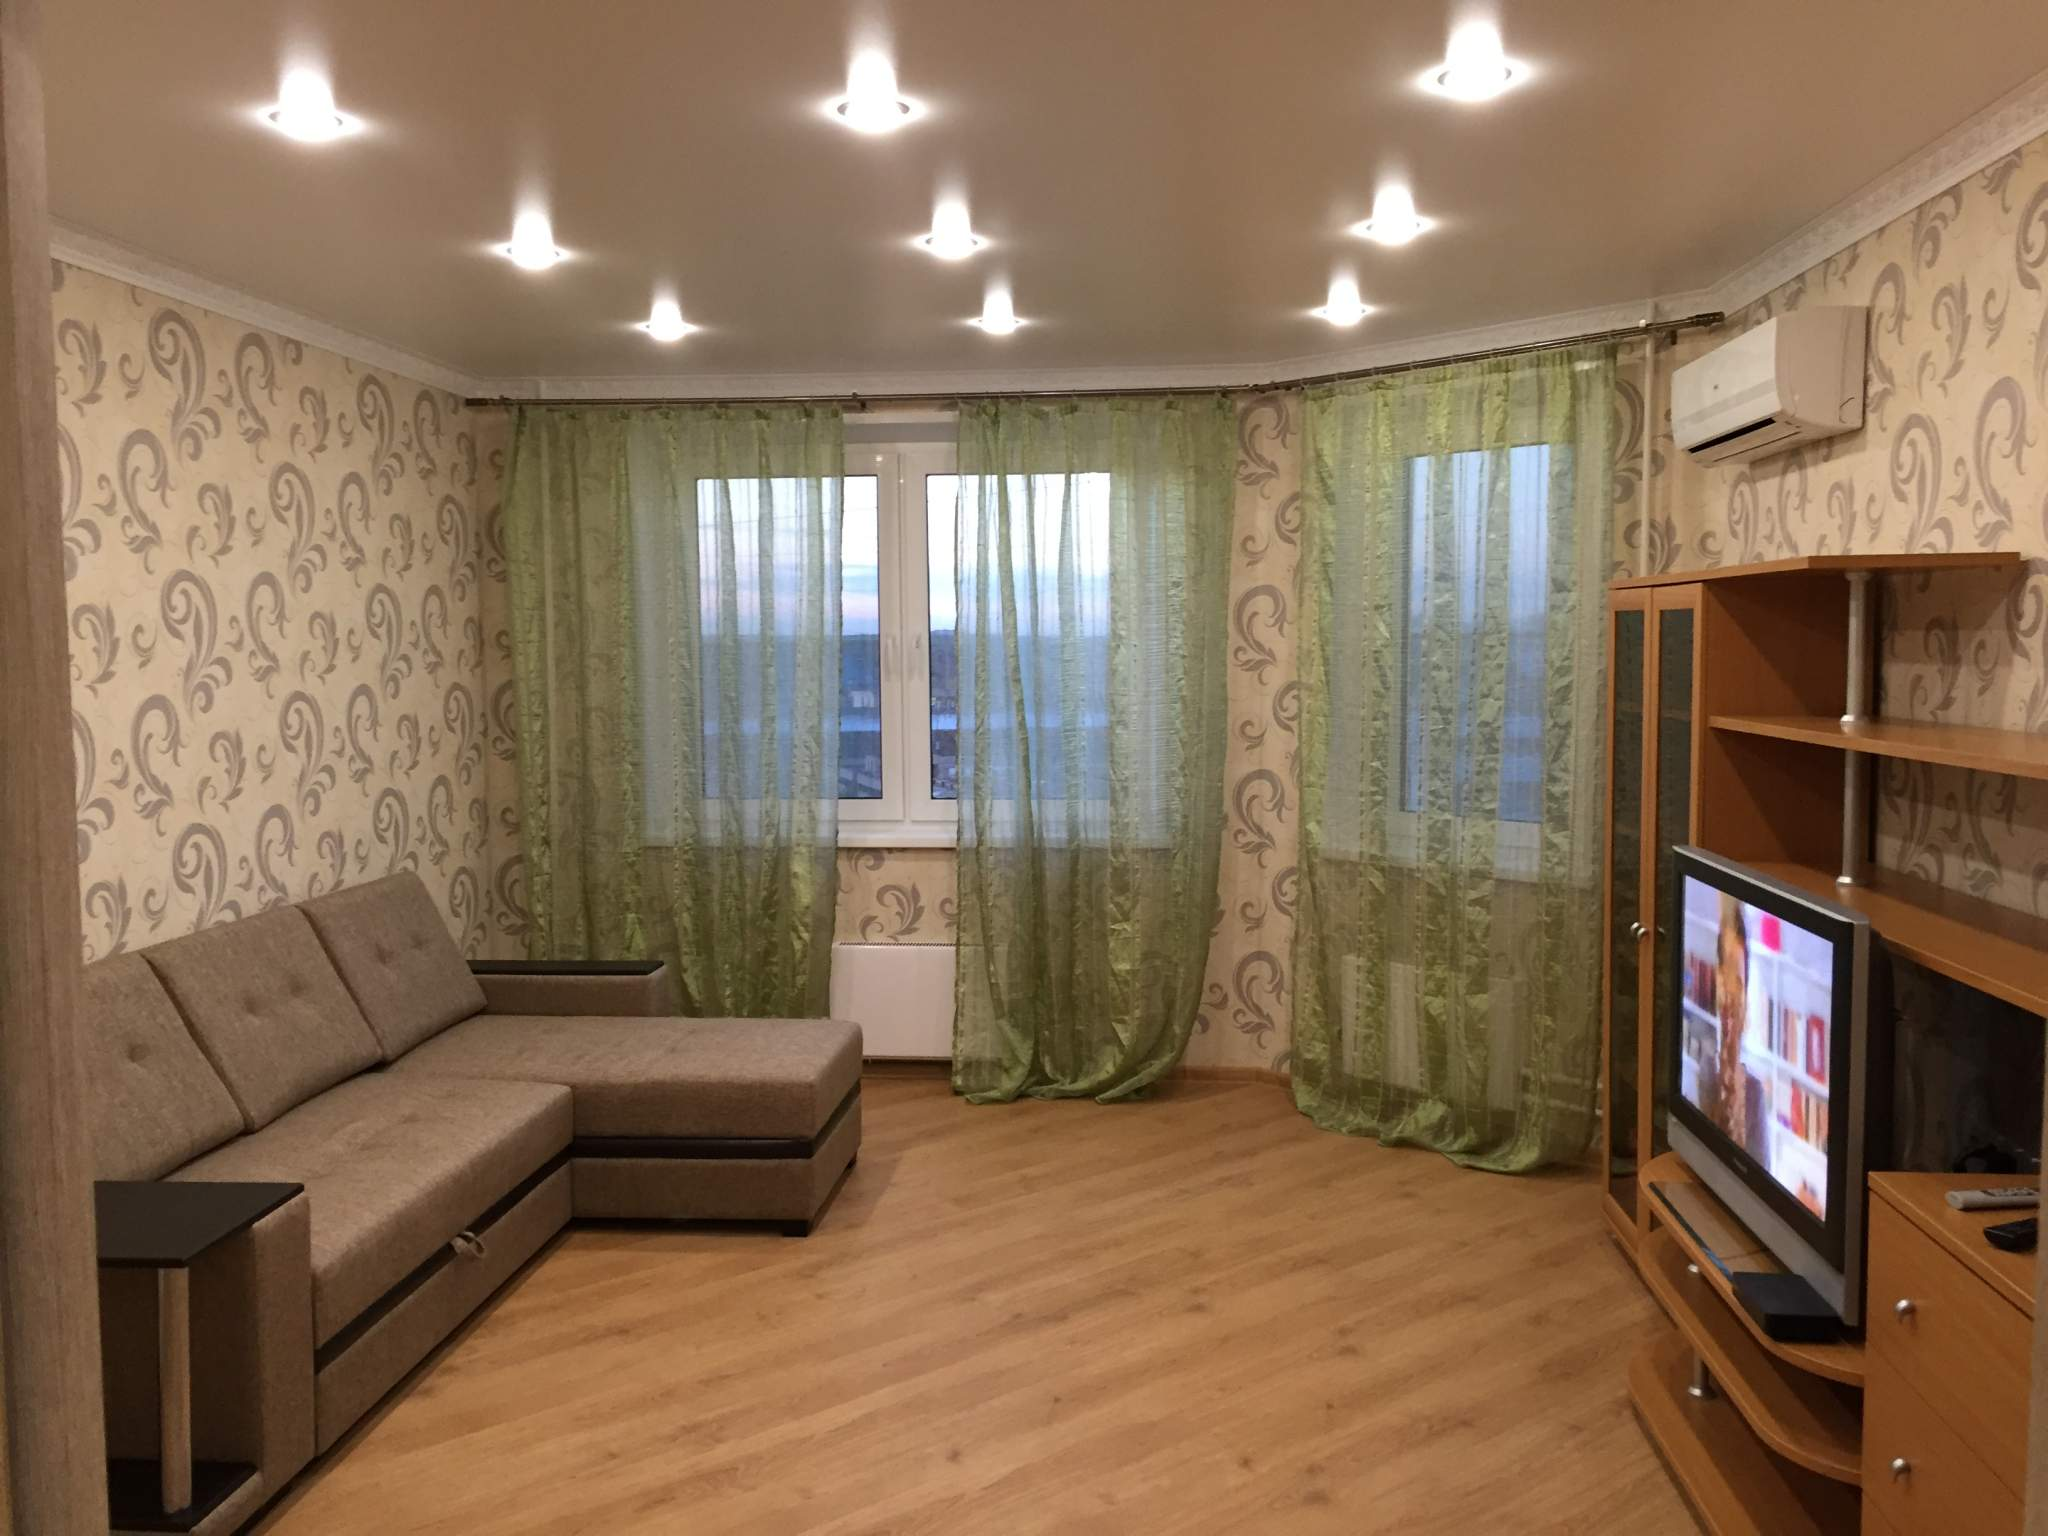 Сниму квартиру в вешках без посредников